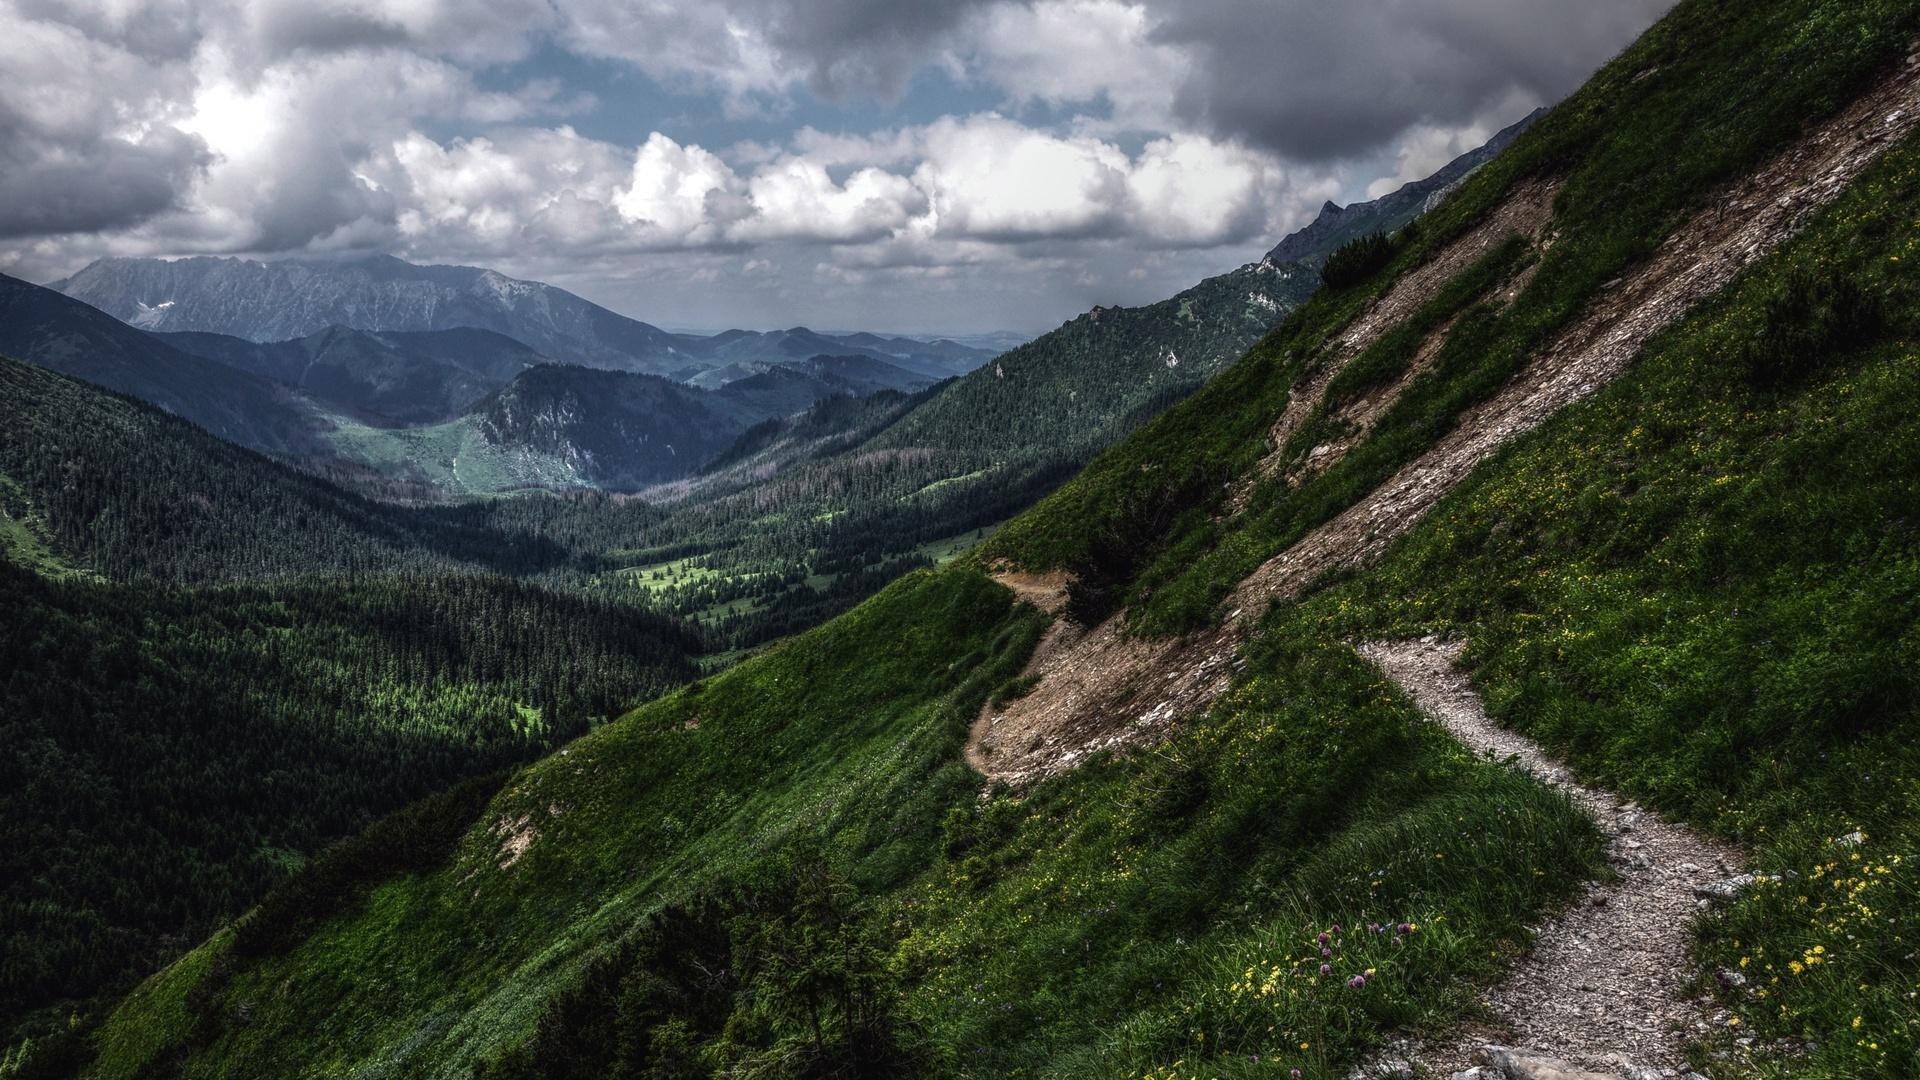 hiking nature wallpaper - photo #5